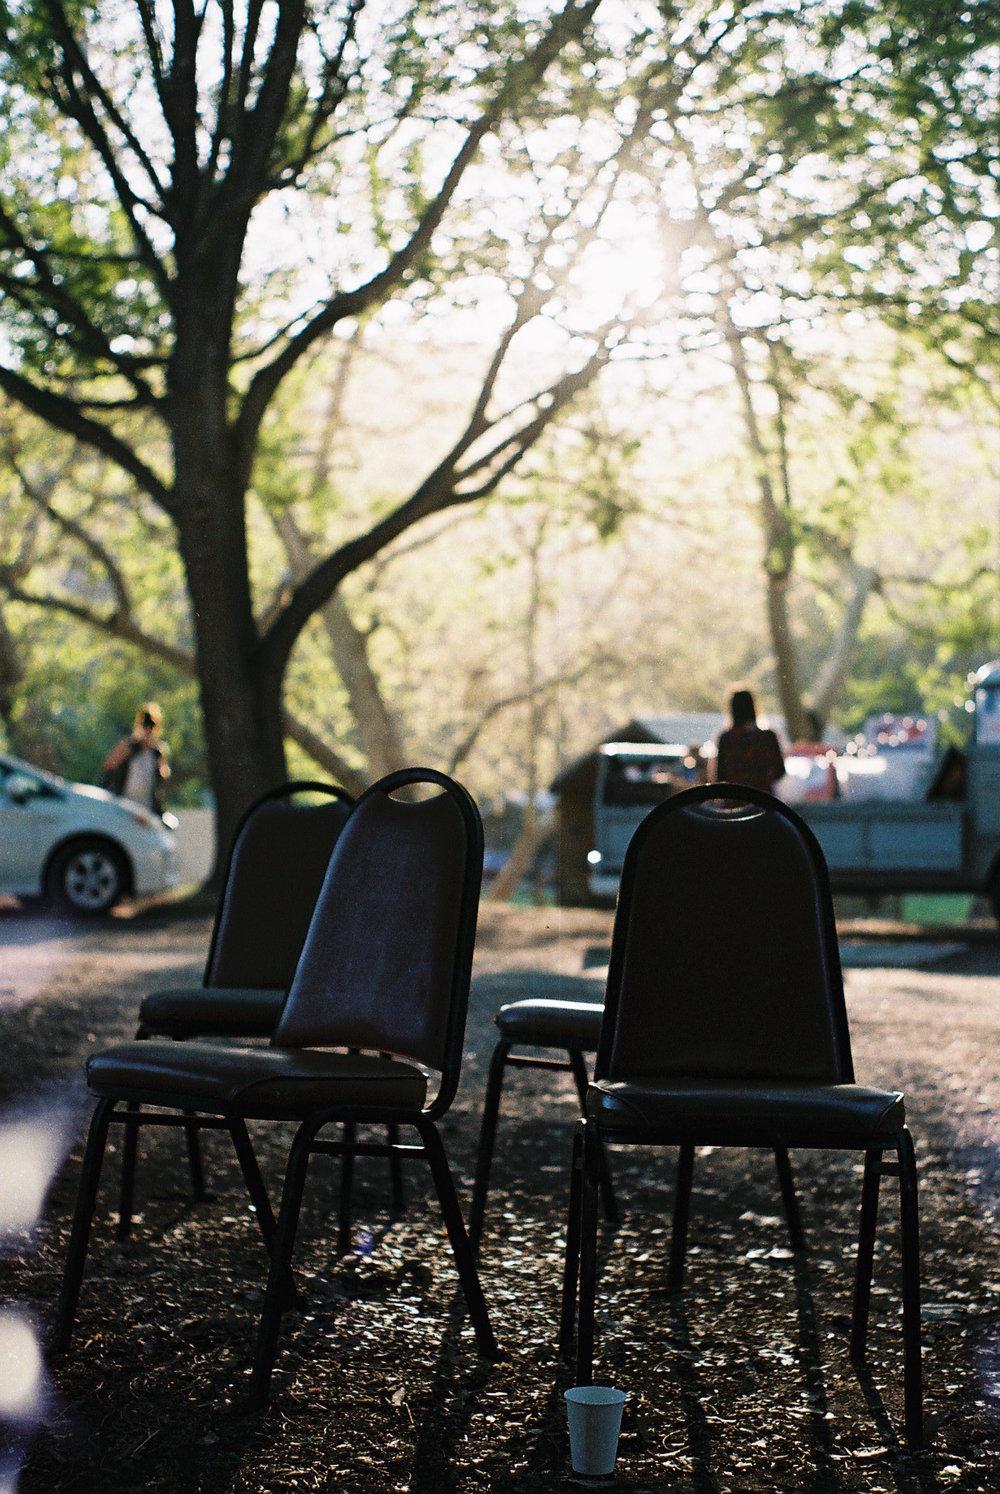 Golden Hour Photo Field Trip California Lifestyle Analogue Photographer